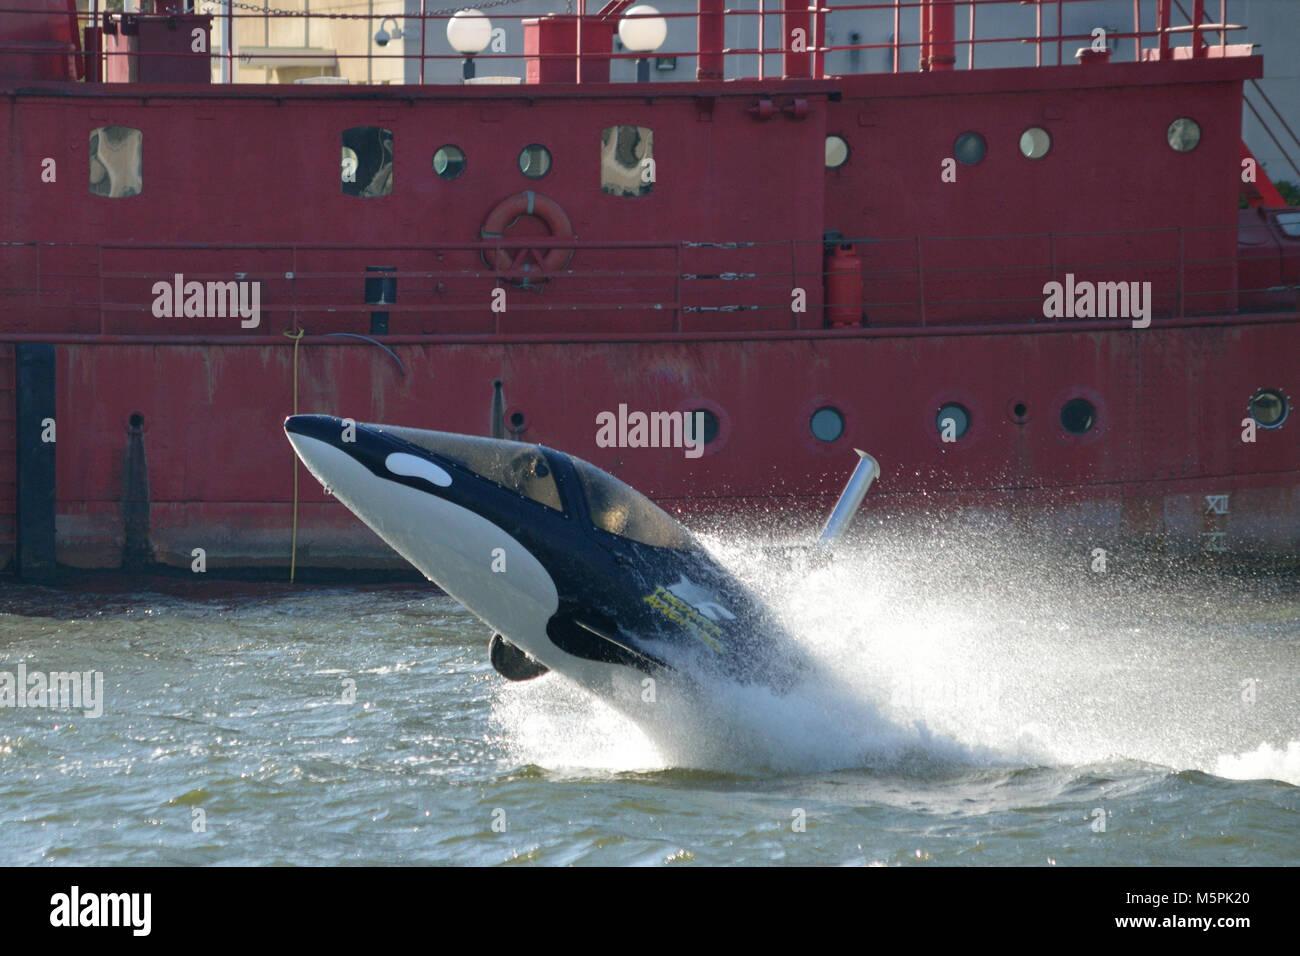 Predator Adventures offering thrill-rides in their Seabreacher Watercraft Killer Whale submersible speedboat in - Stock Image